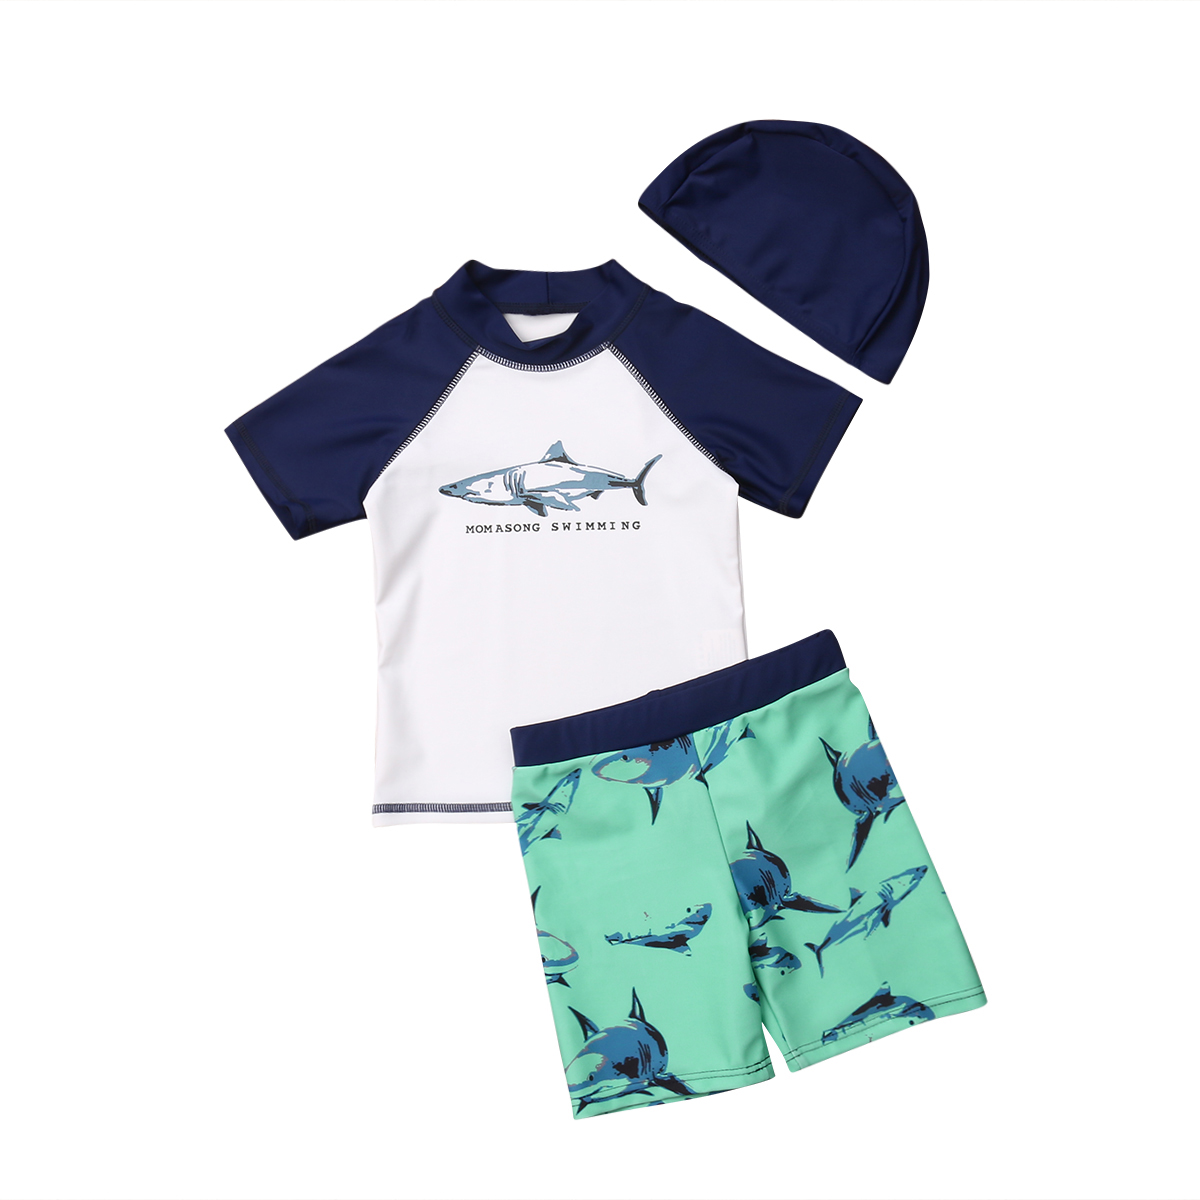 ddcd660a25 Shorts And T Shirt Swimwear - raveitsafe